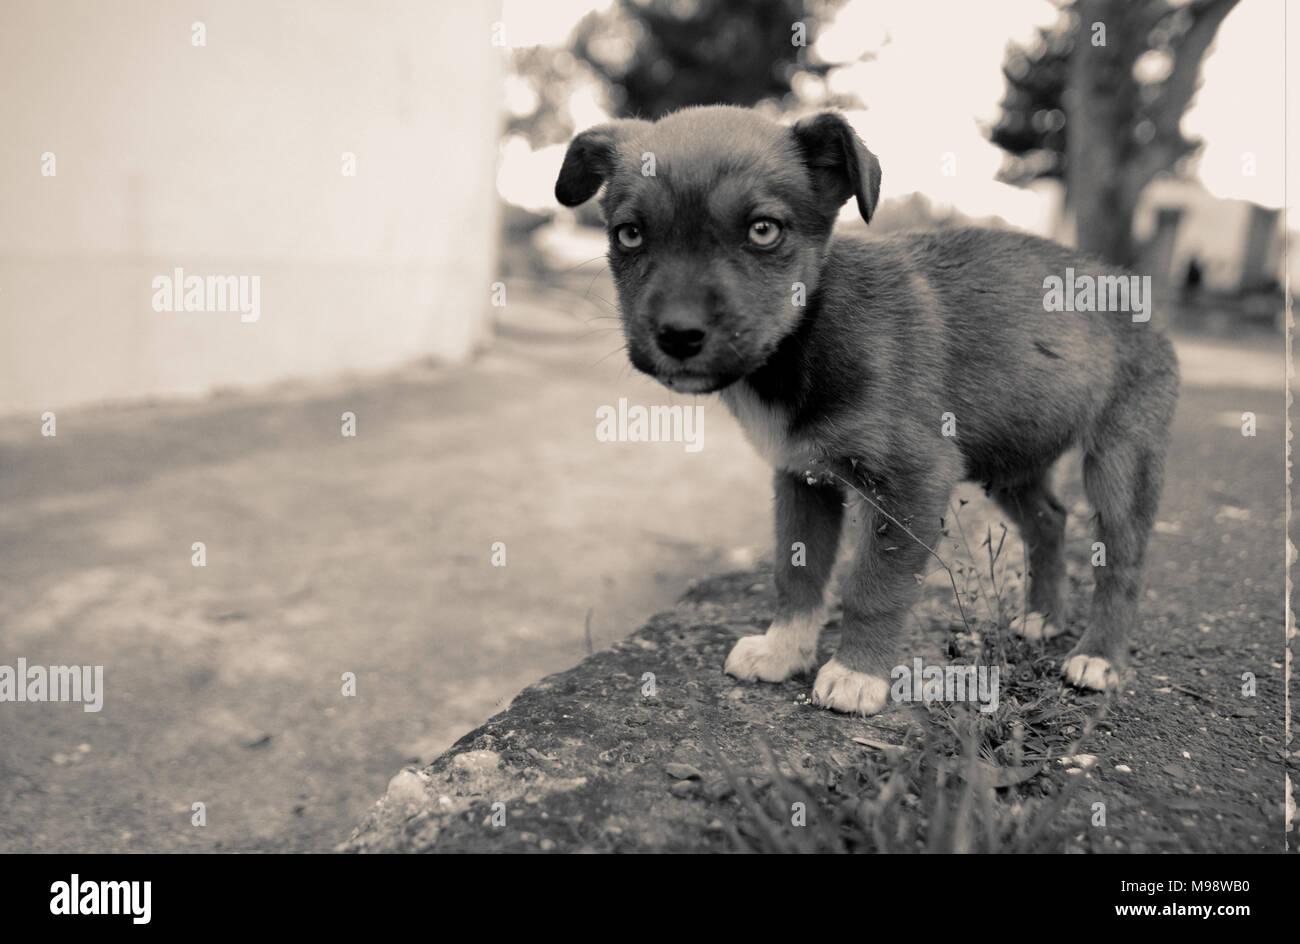 sad stray puppy, animal themes, shalow dof - Stock Image